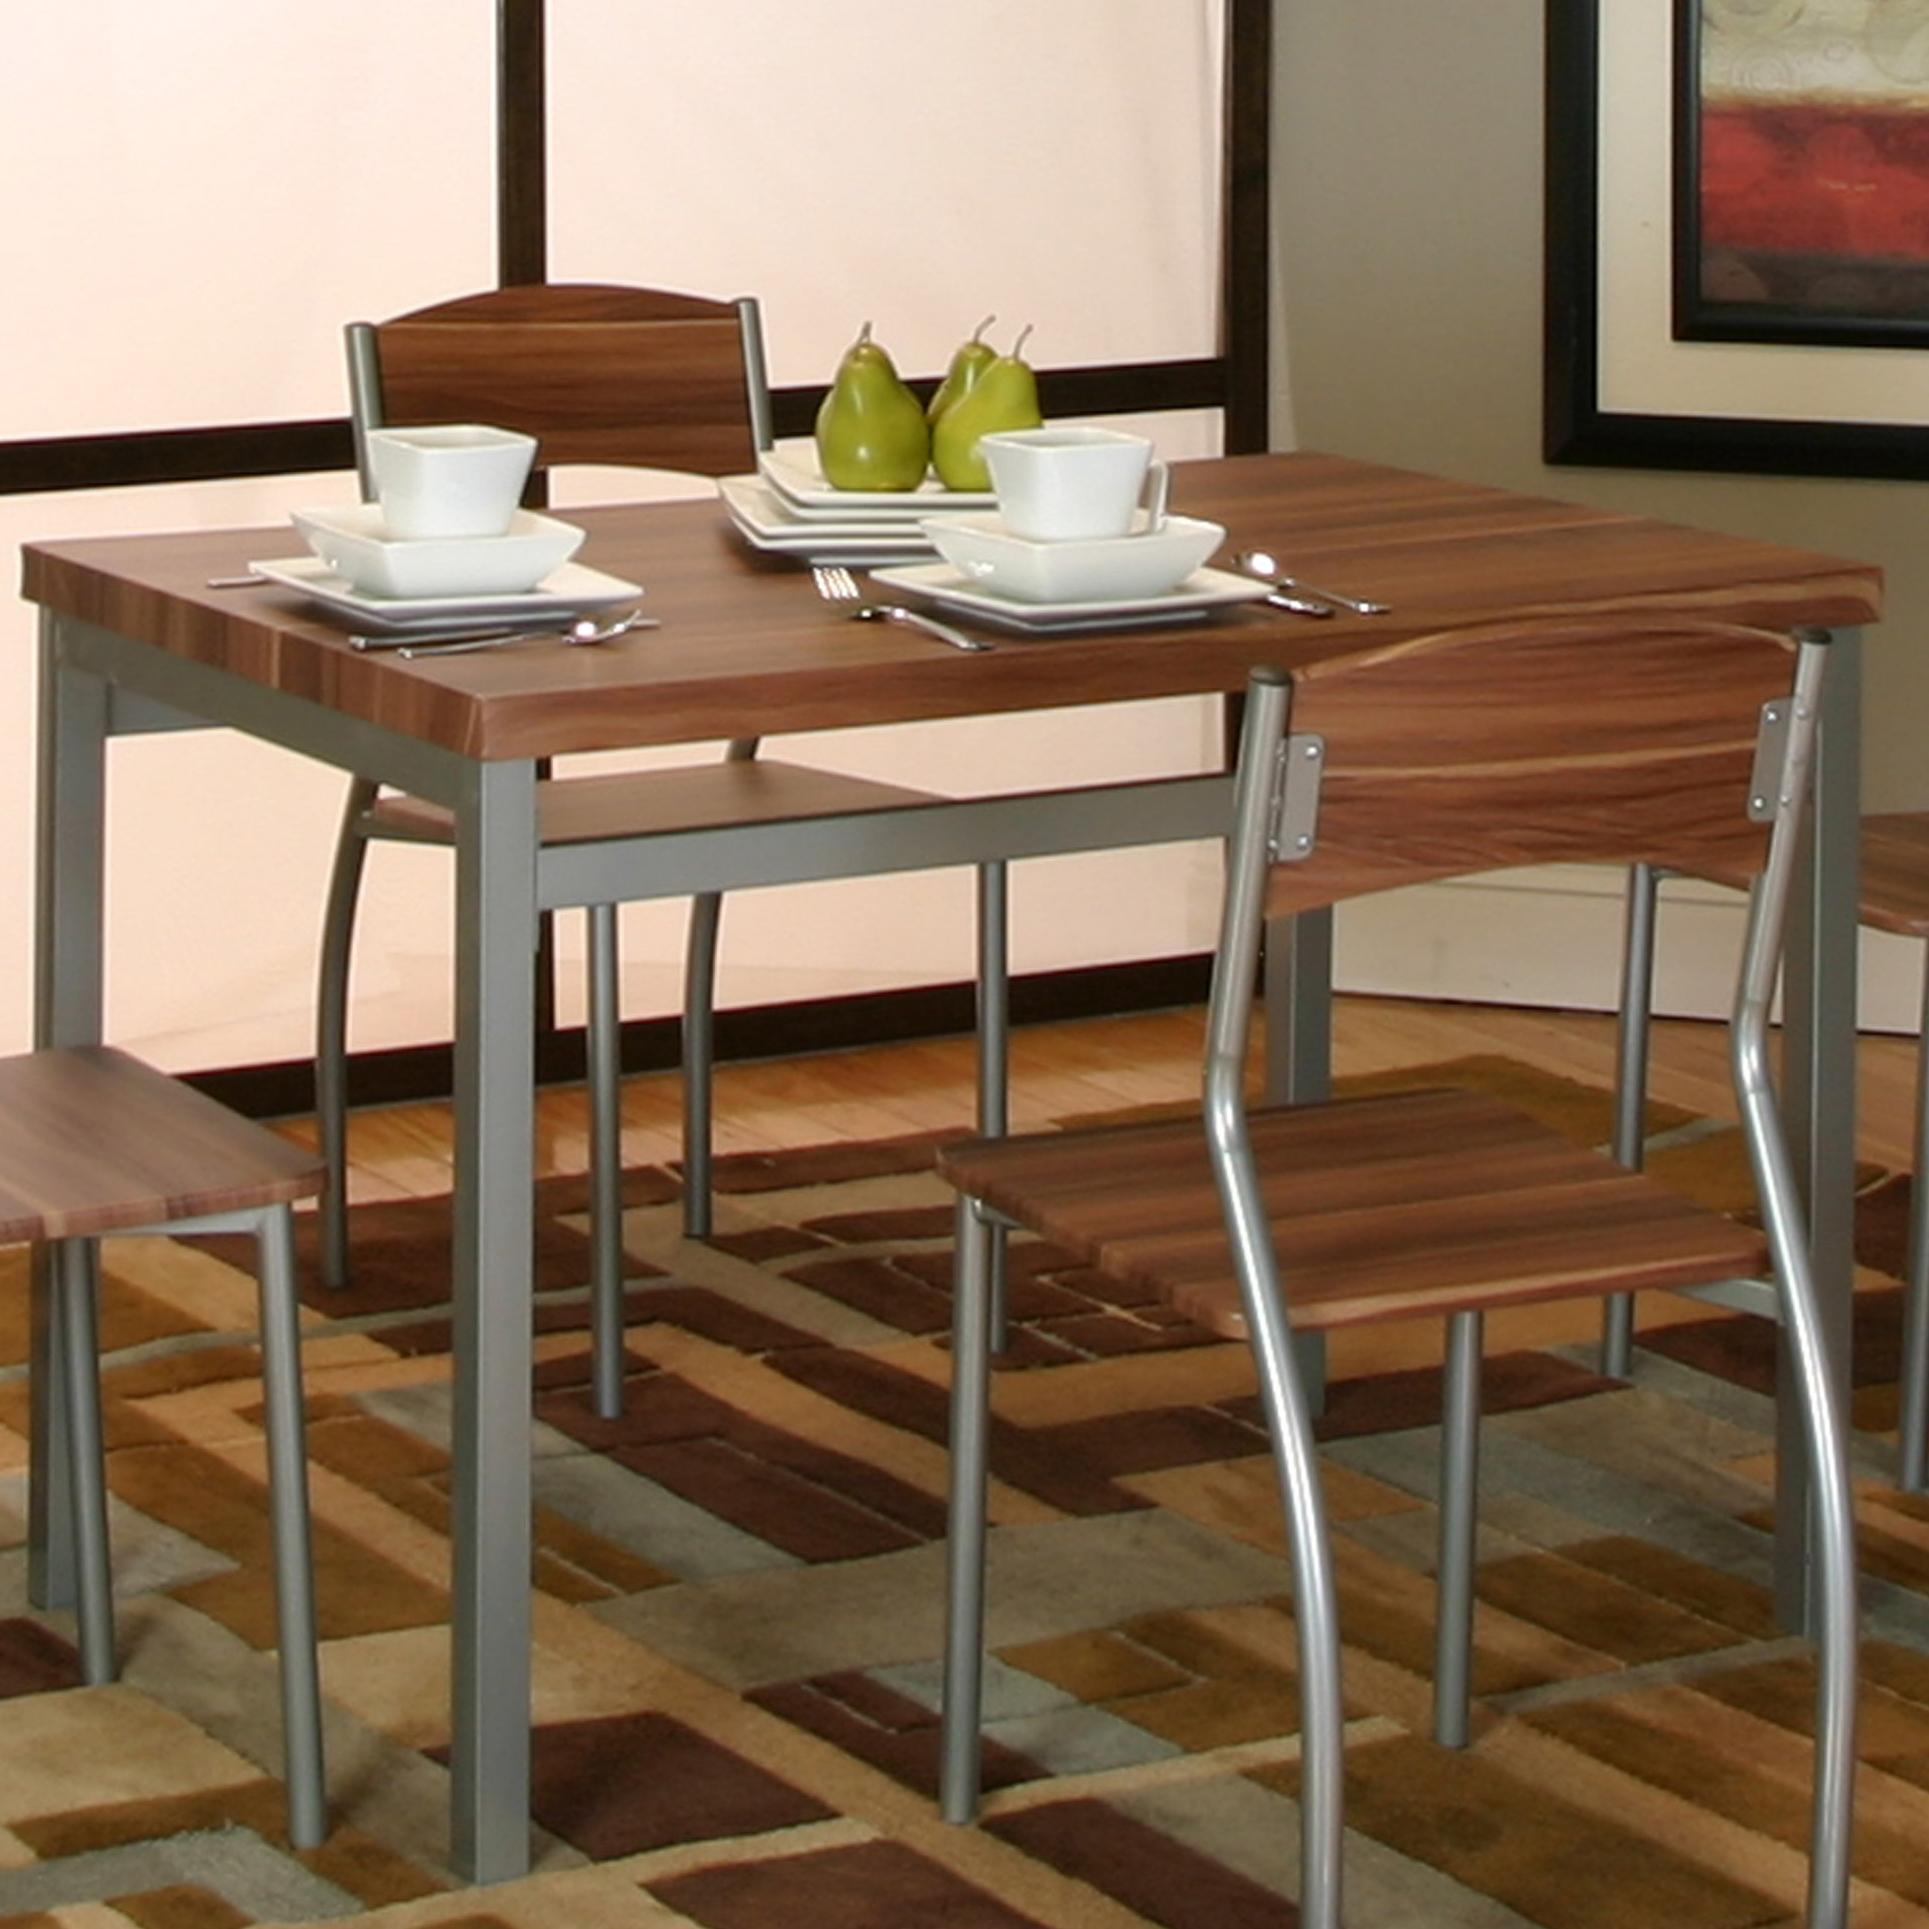 value city kitchen sets virtual designer online cramco inc lark platinum acacia veneer table